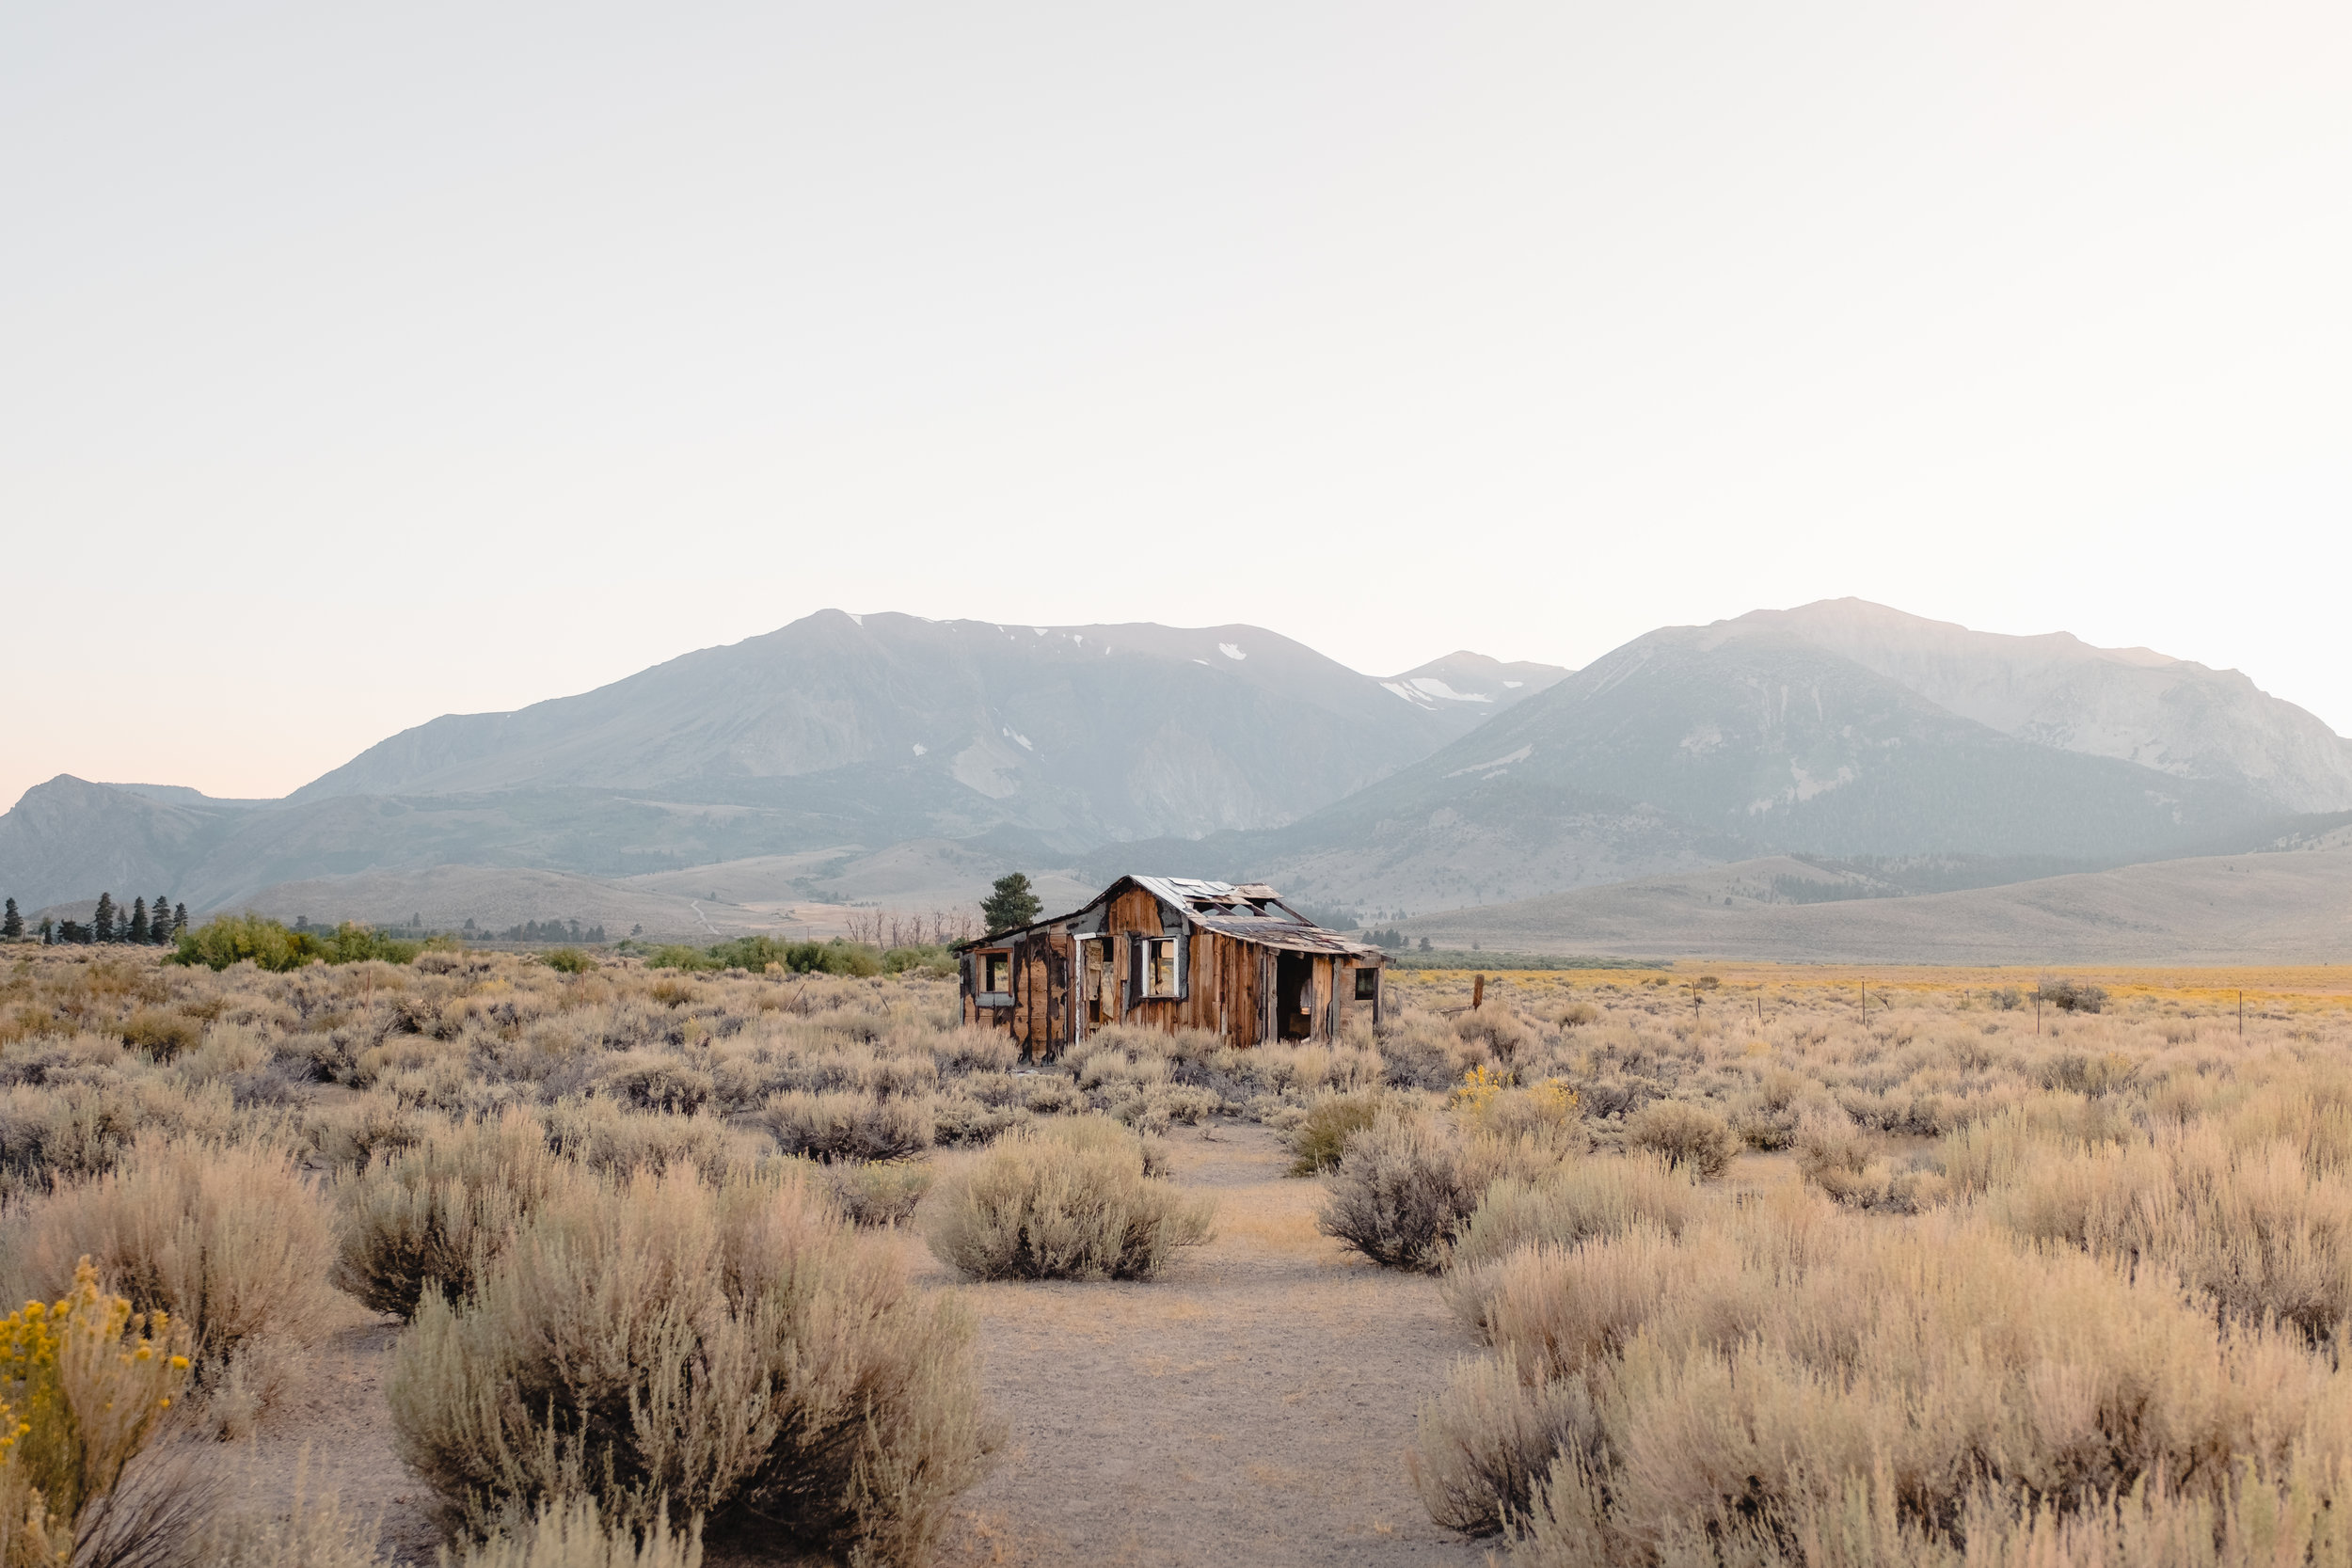 Death_Valley_National_Park1.jpg